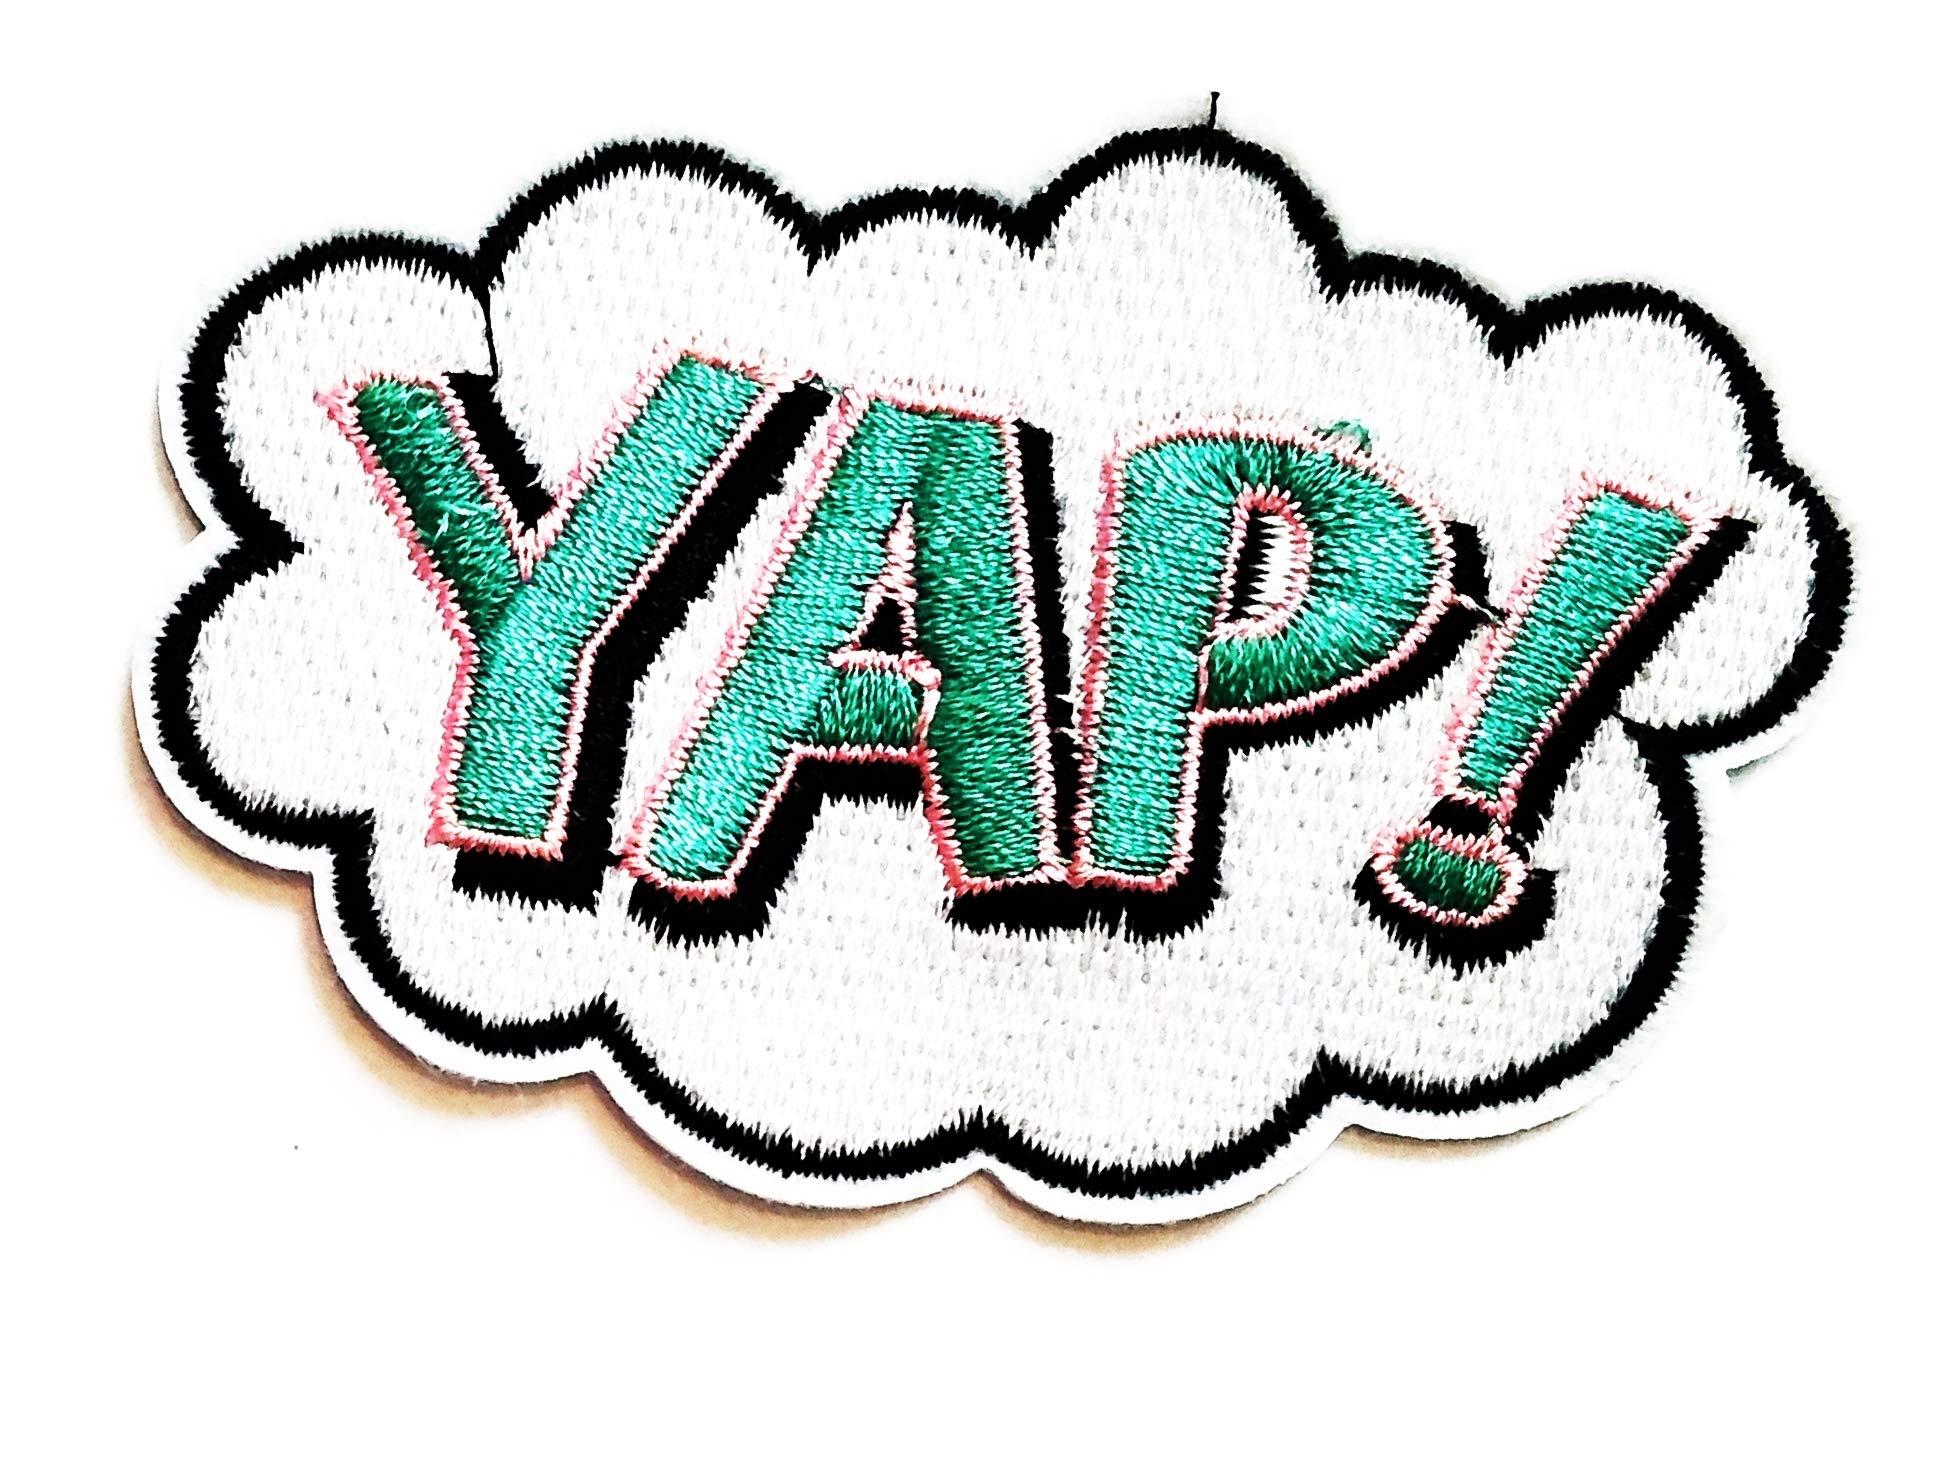 Nipitshop Patches YAP! Super Power Joke Funny Words